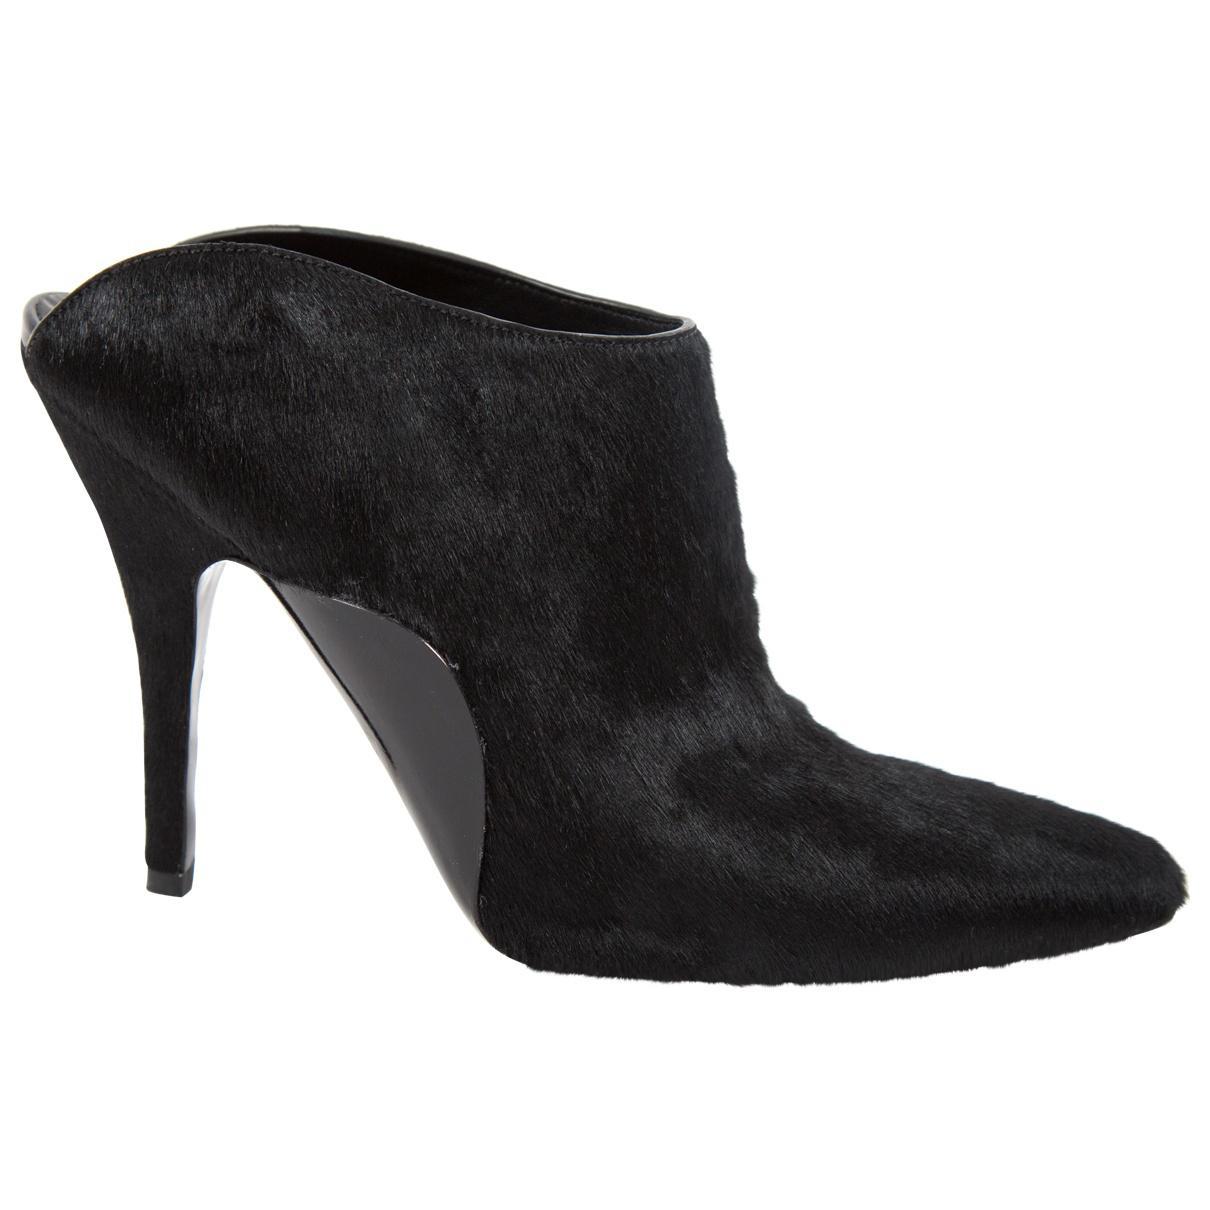 Pre-owned - Pony-style calfskin heels Alexander Wang eMgAB9HGSL